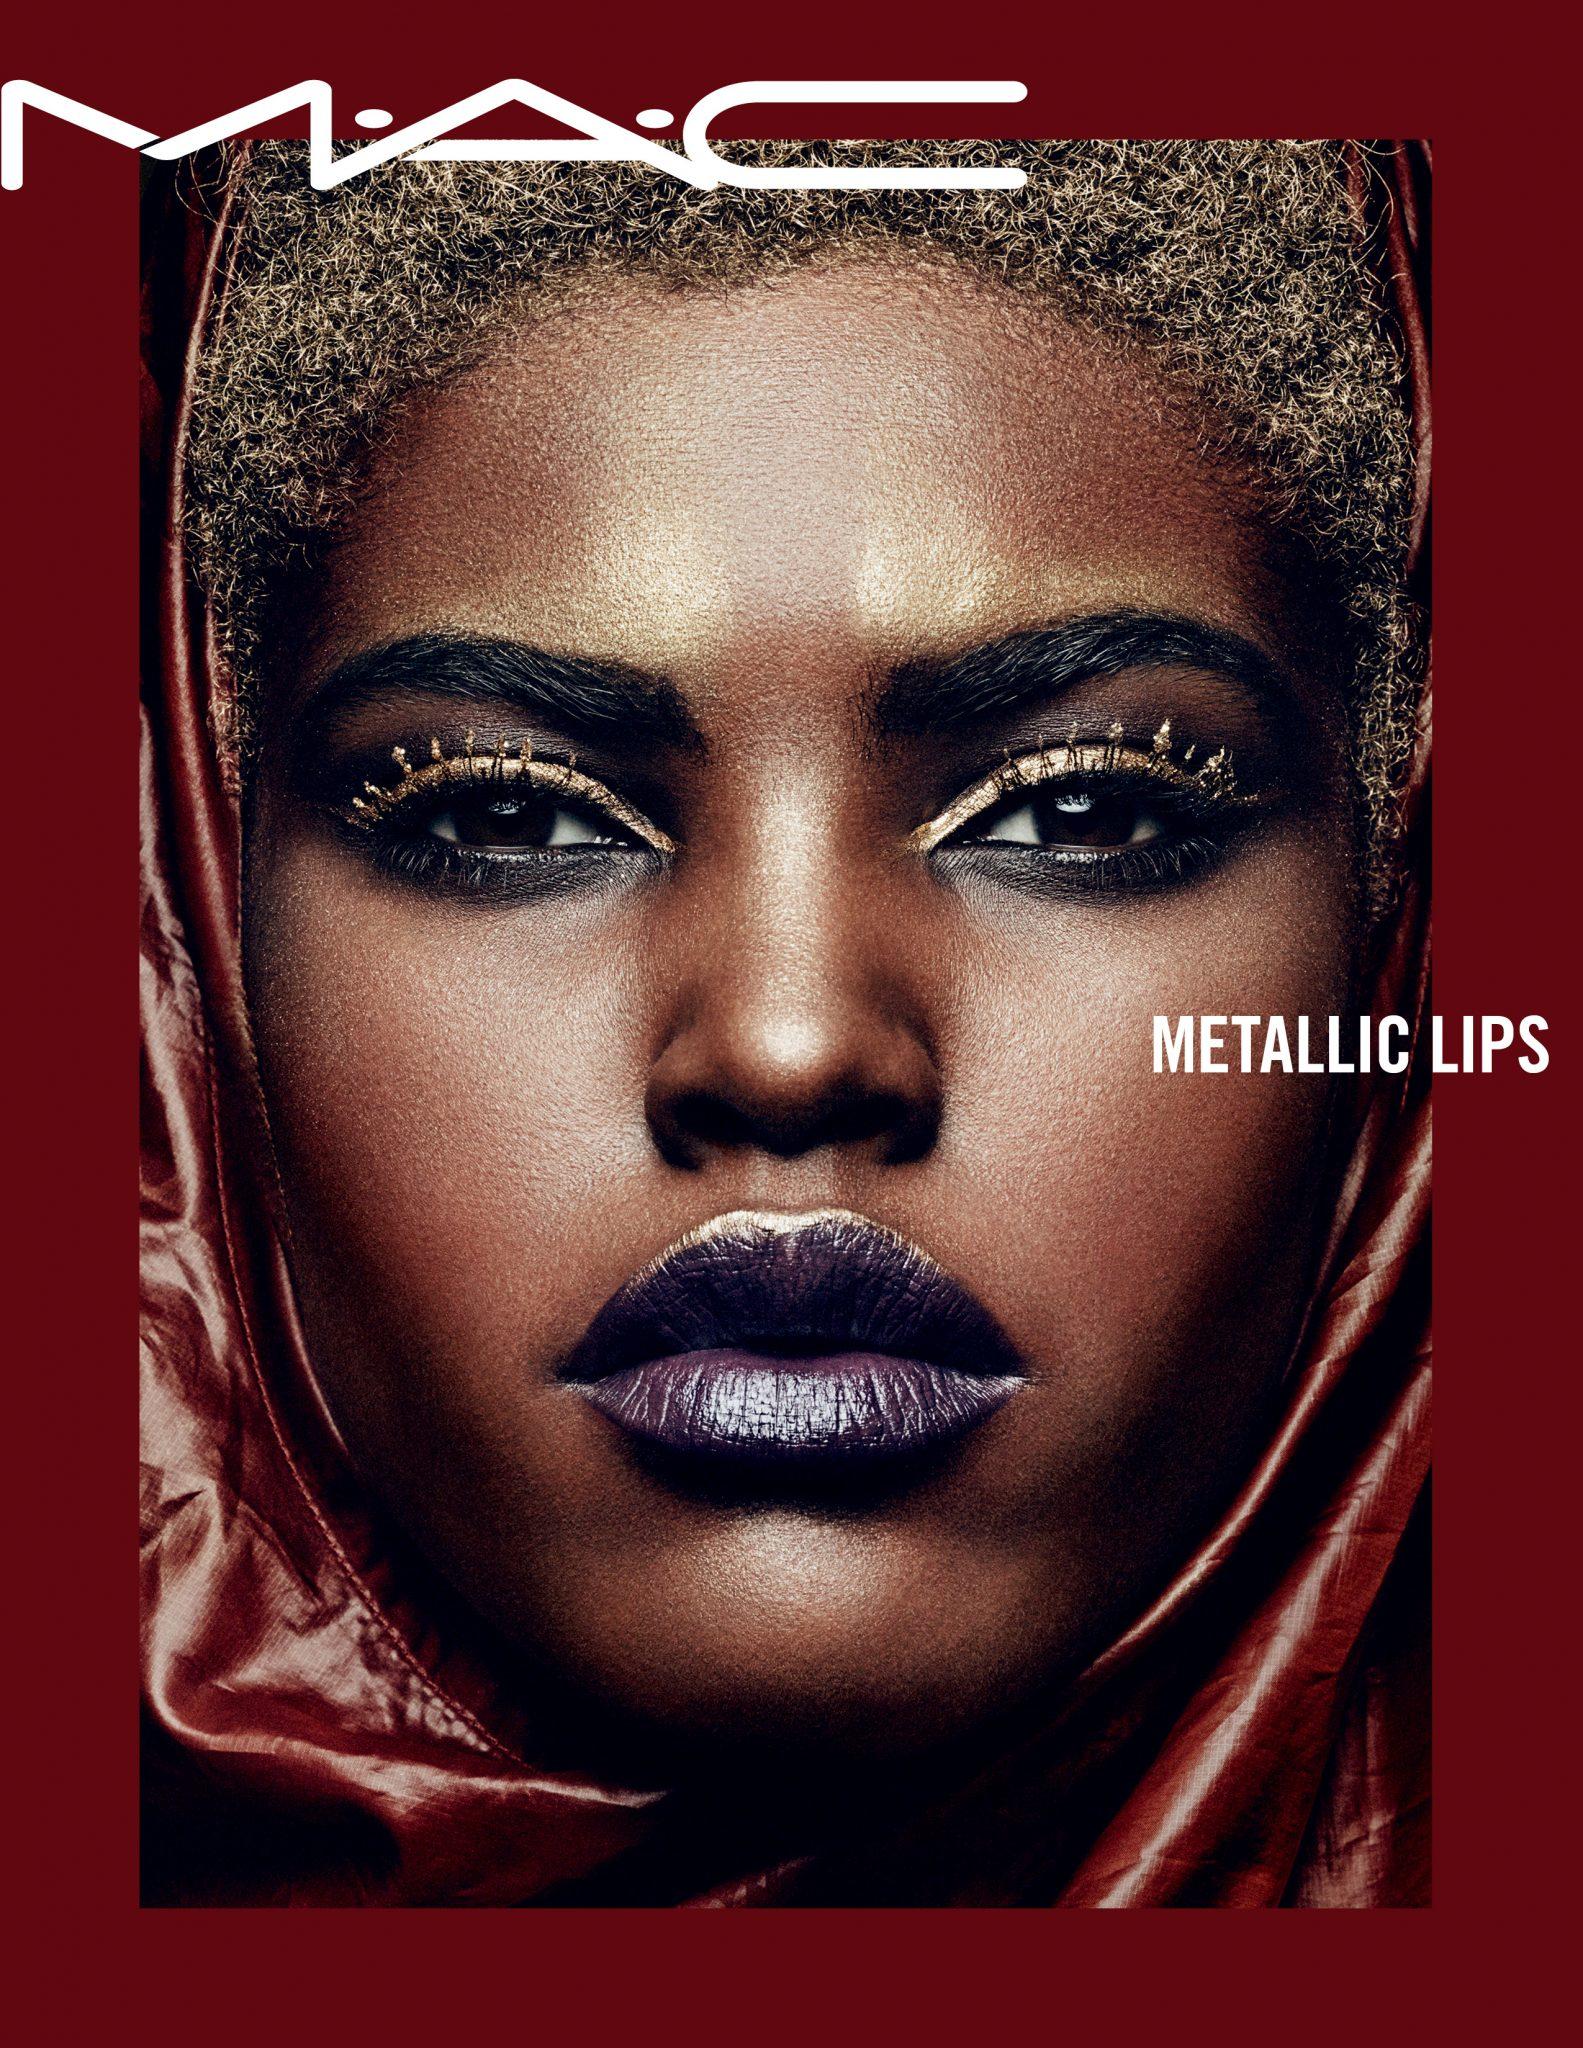 M.A.C Presents: M.A.C Metallic Lips